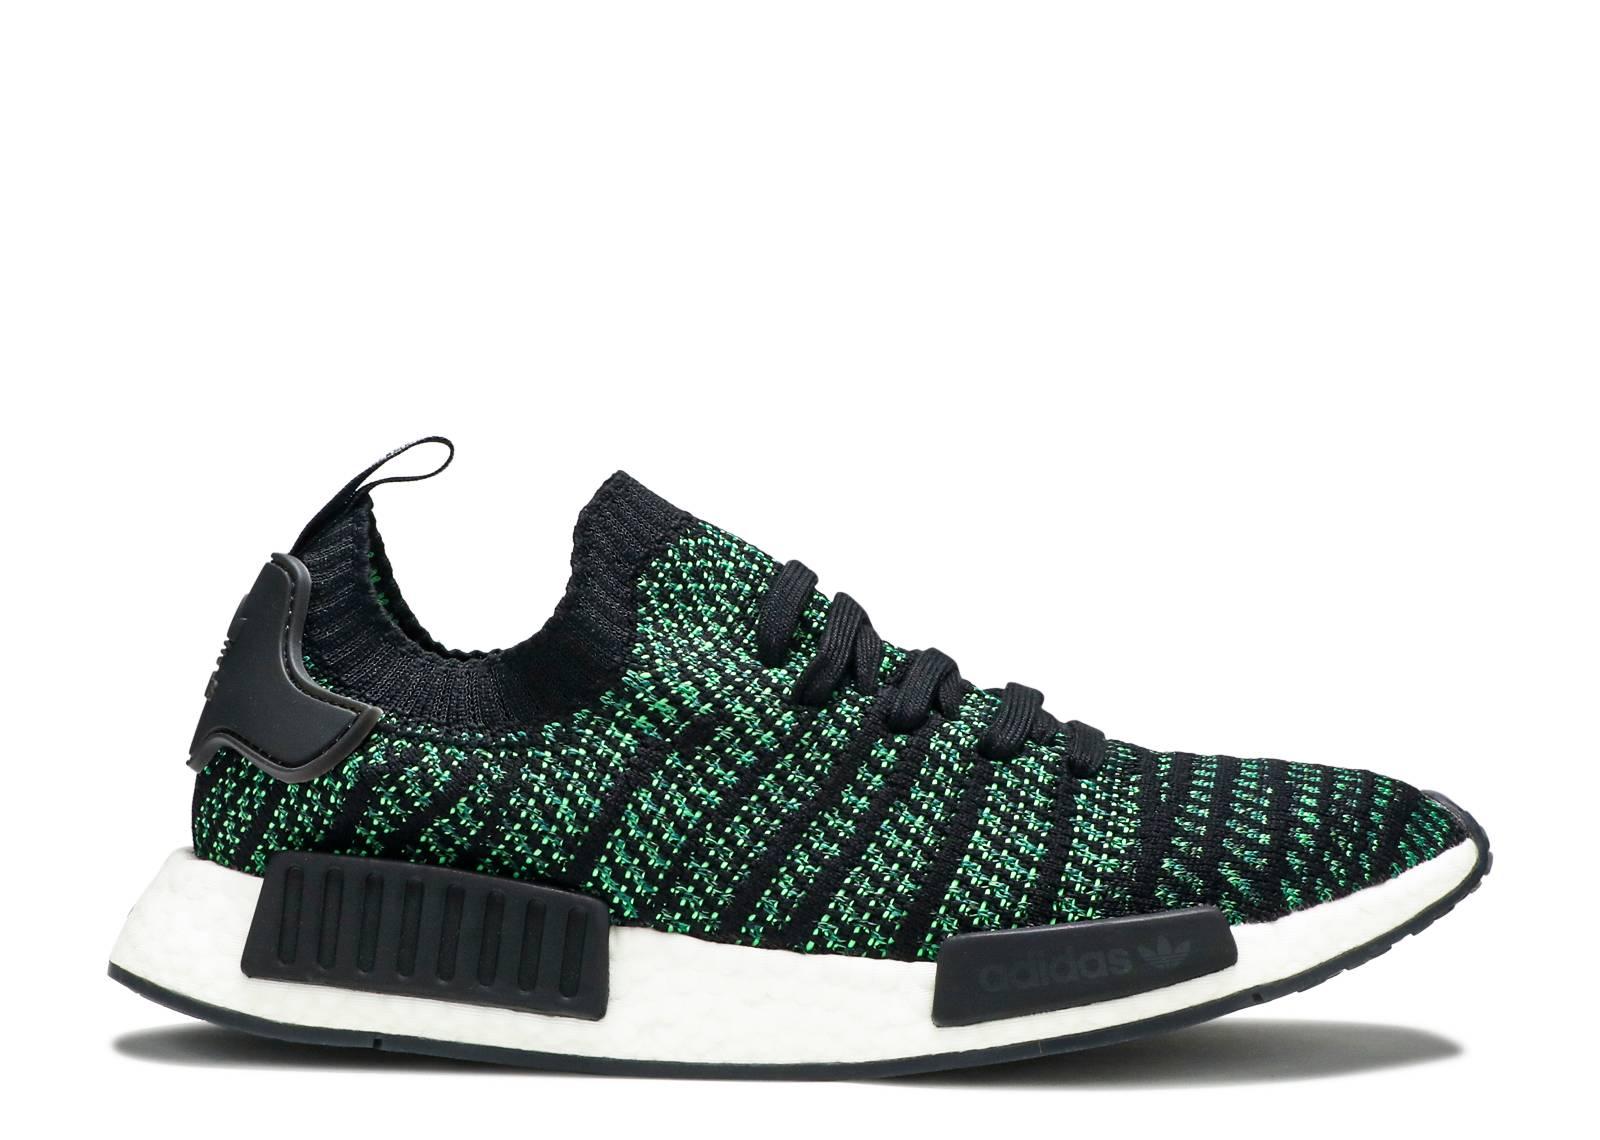 da1700d34961b Nmd R1 Stlt Pk - Adidas - aq0936 - black noble green  bold green ...